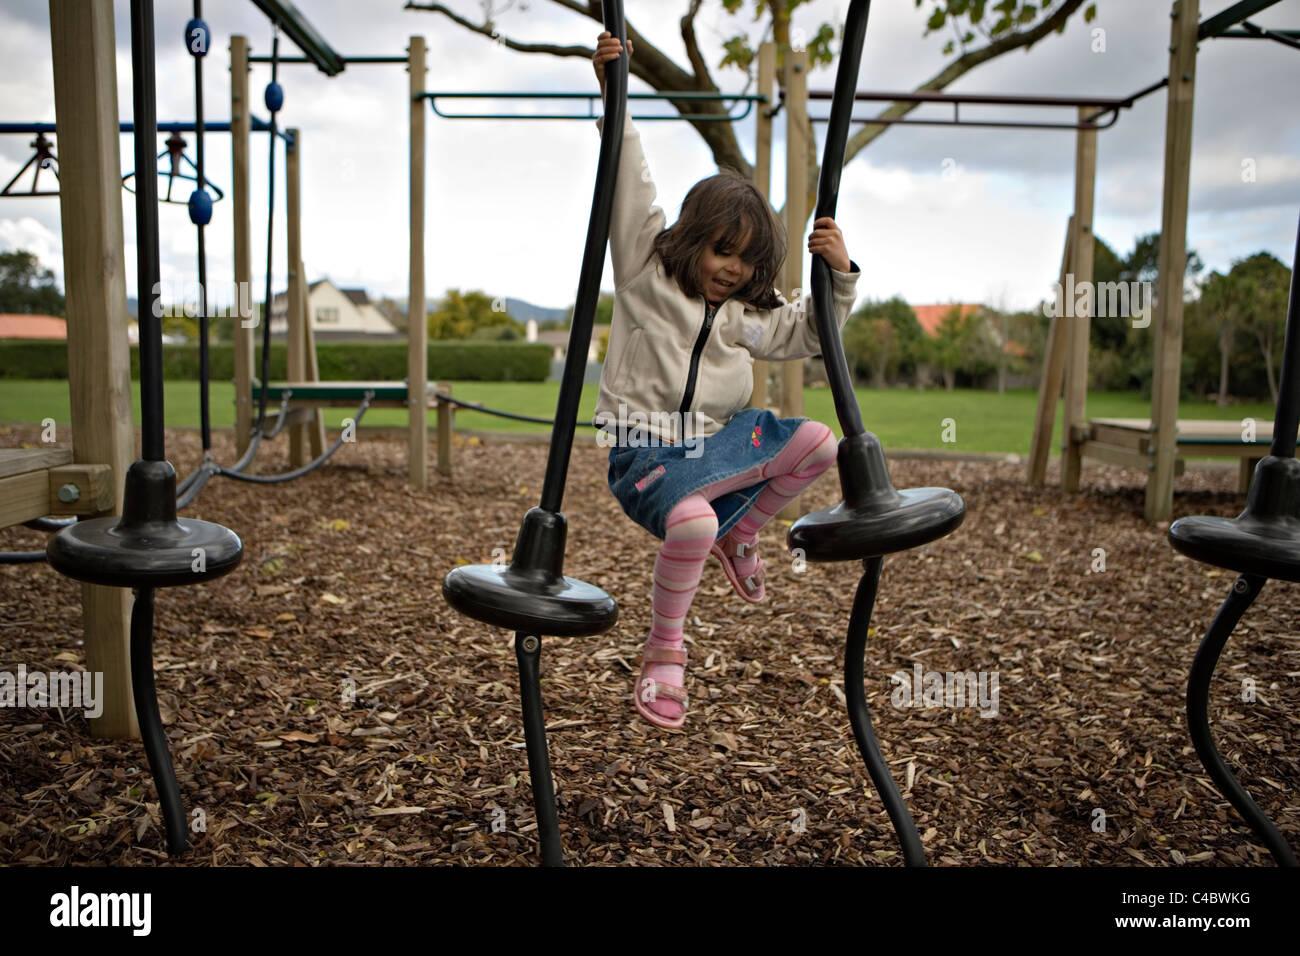 Adventure playground at local school, Palmerston North, New Zealand. Stock Photo